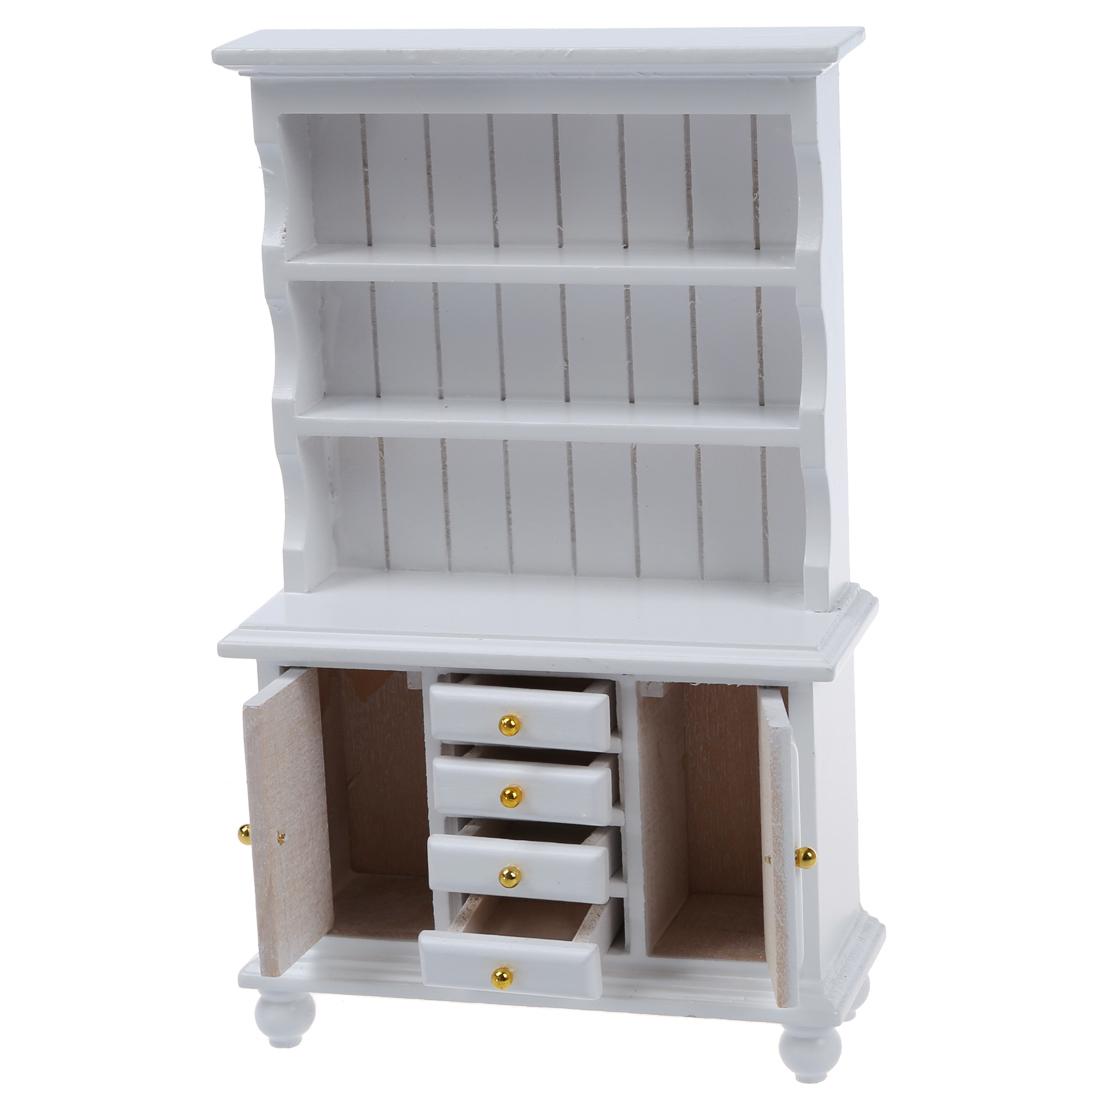 1 12 puppenhaus miniatur moebel multifunktions holzgehaeuse buecherregal weiss ebay. Black Bedroom Furniture Sets. Home Design Ideas